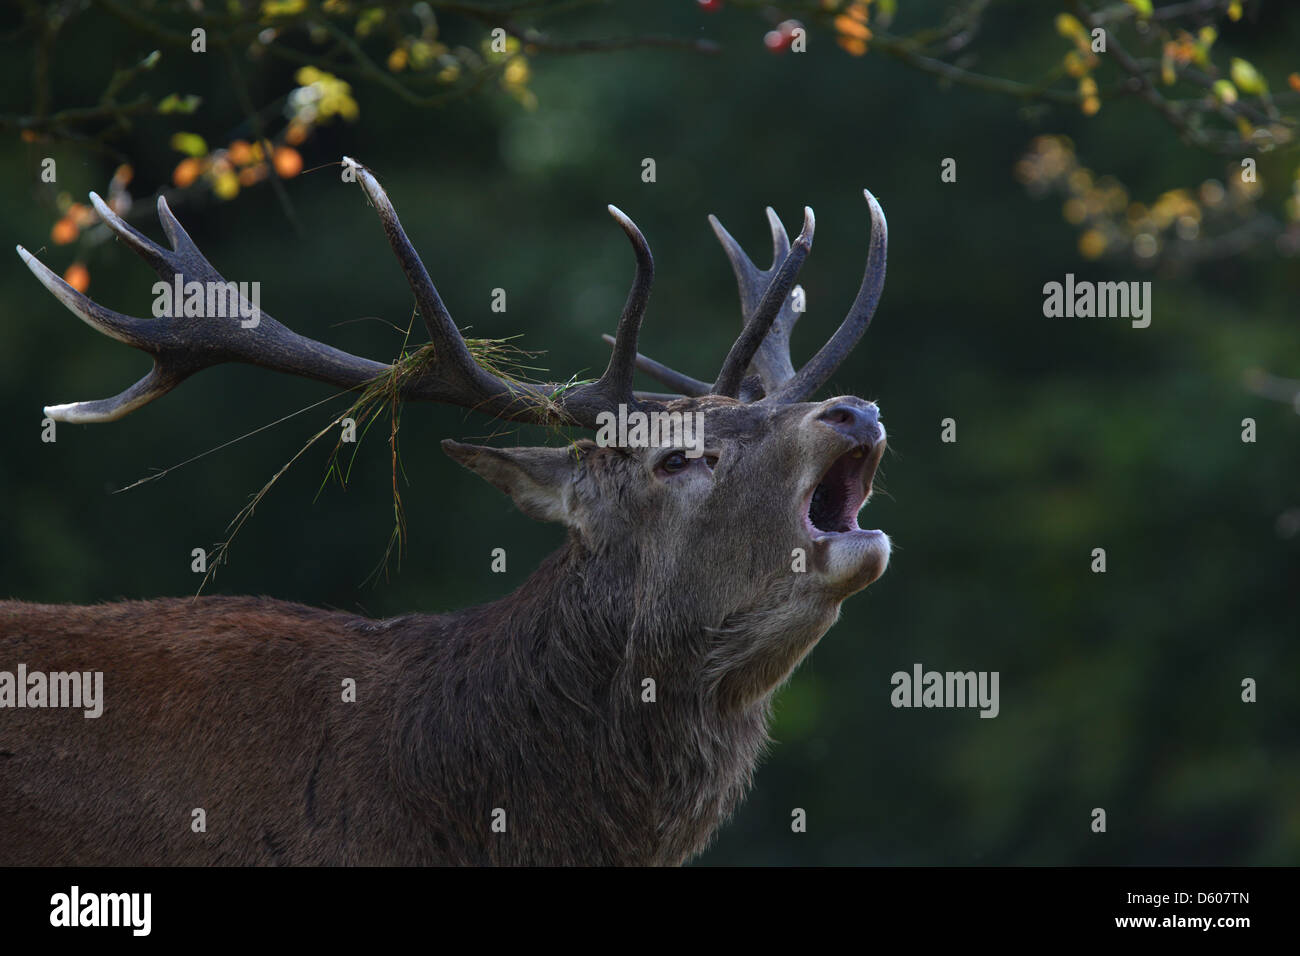 Ruggito Il cervo (Cervus elaphus), Europa Immagini Stock